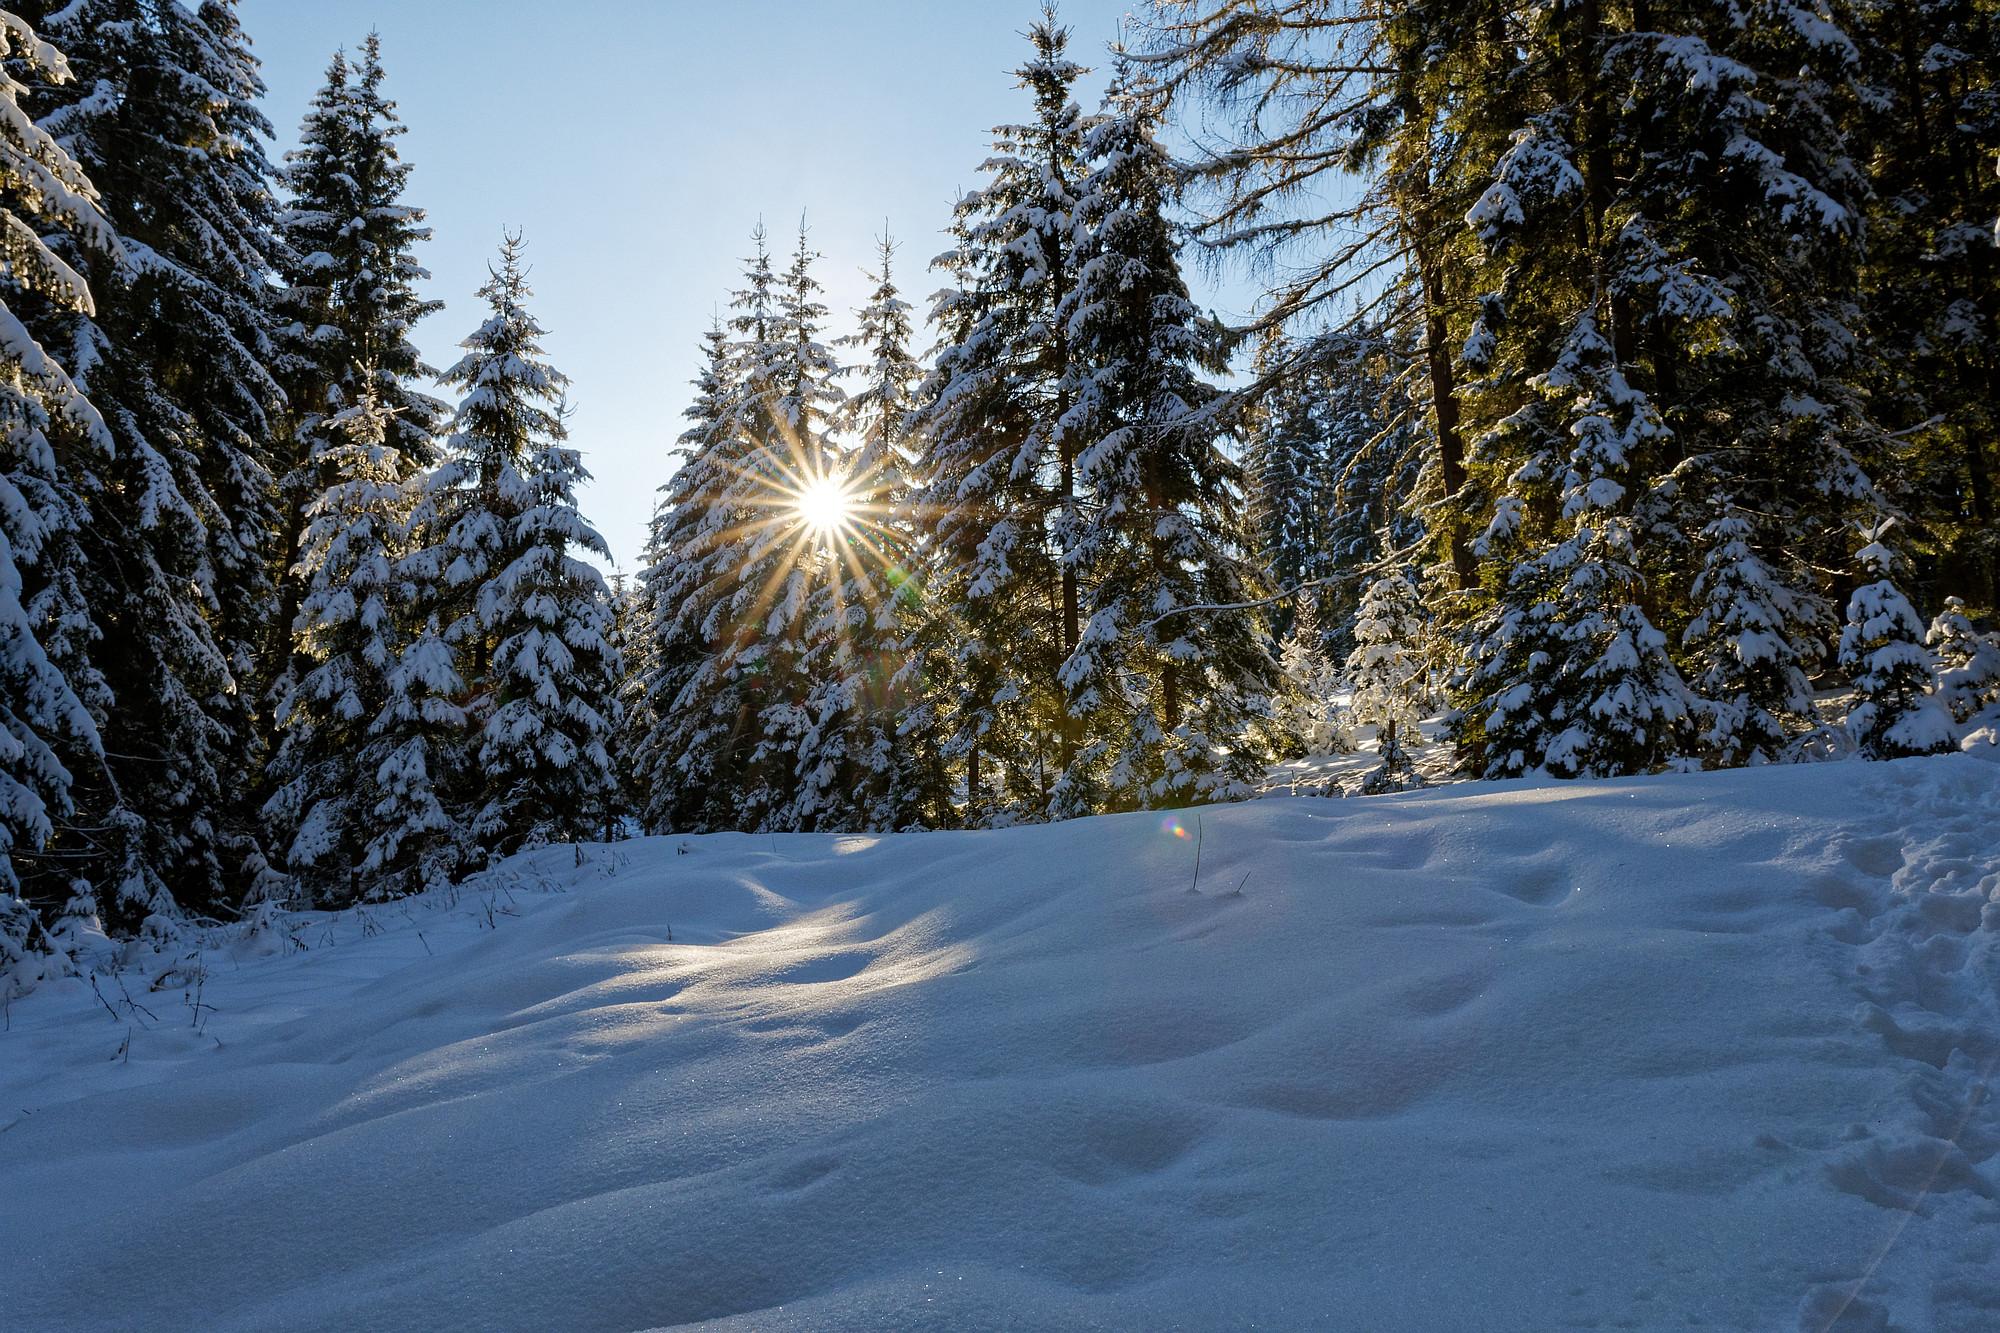 wintersonne im wald 2021-01-25